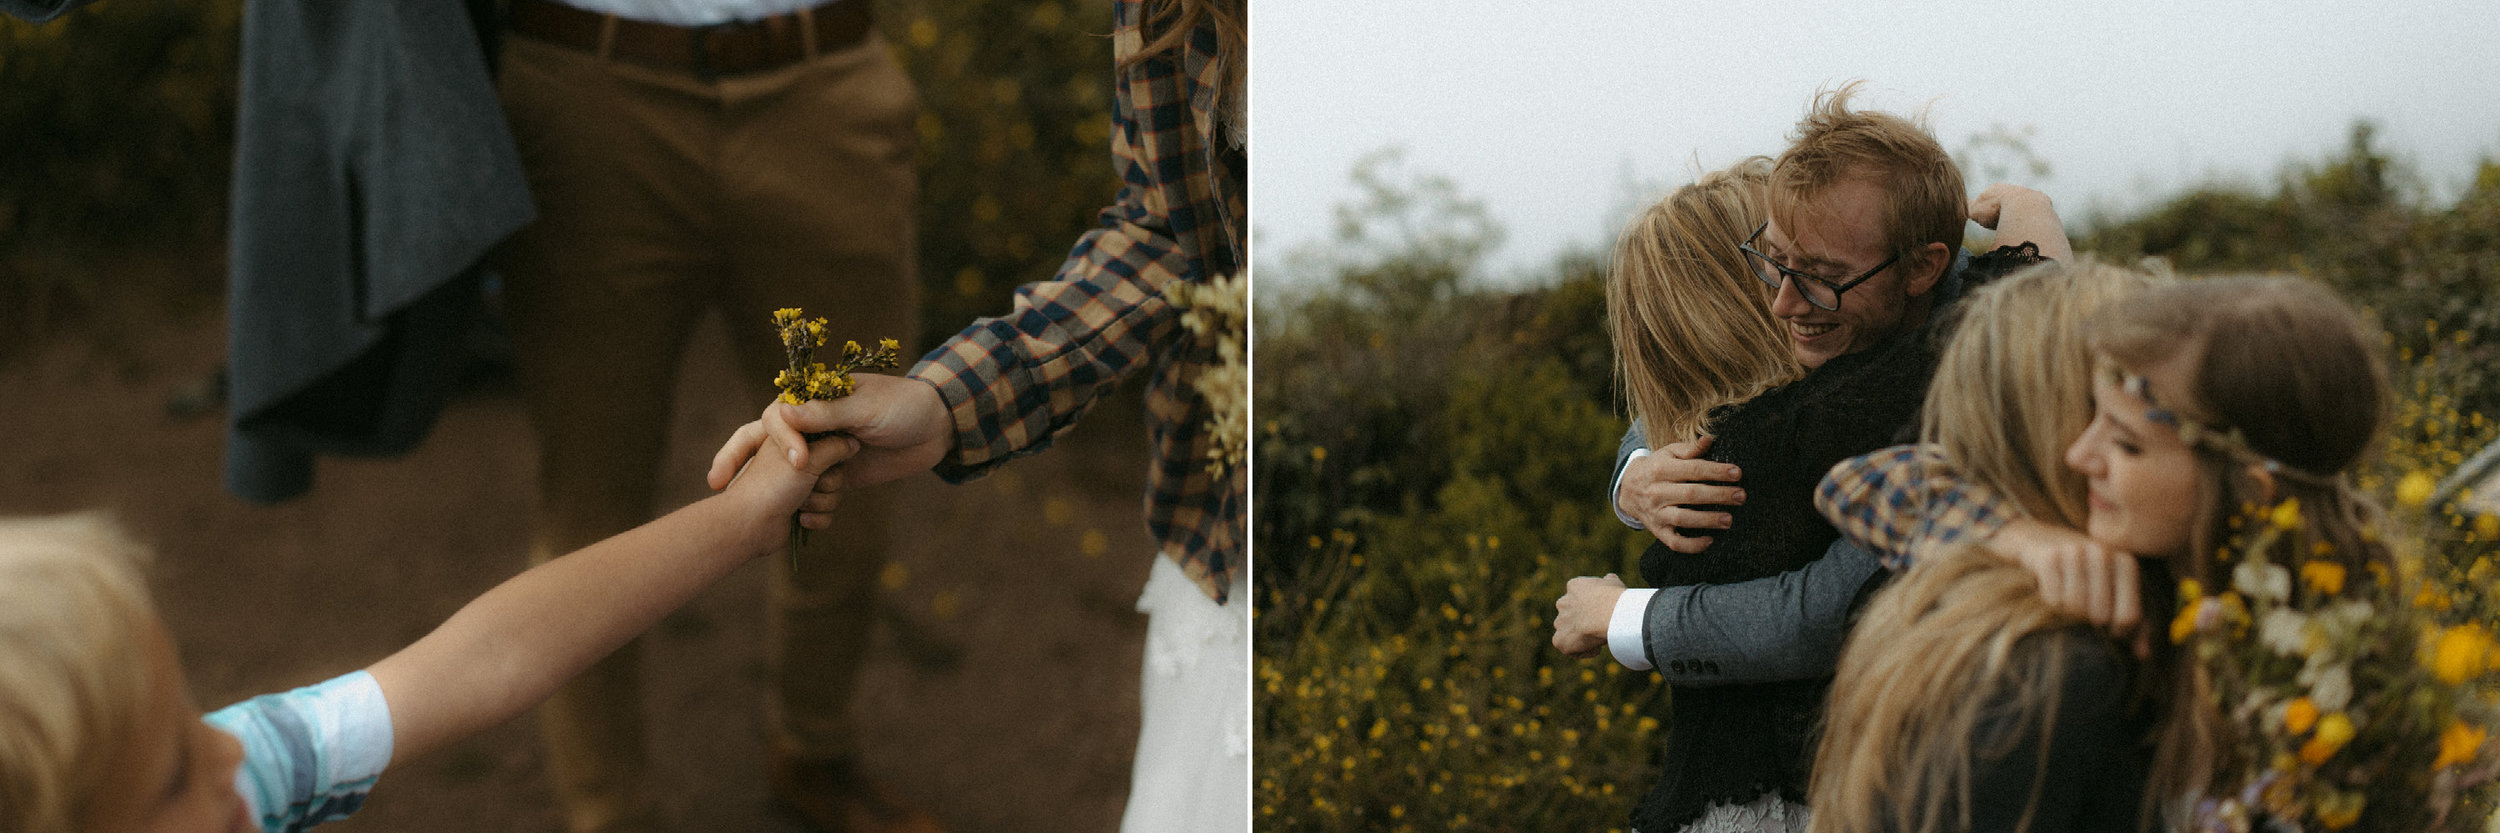 big-sur-adventure-elopement-photographer-109.jpg